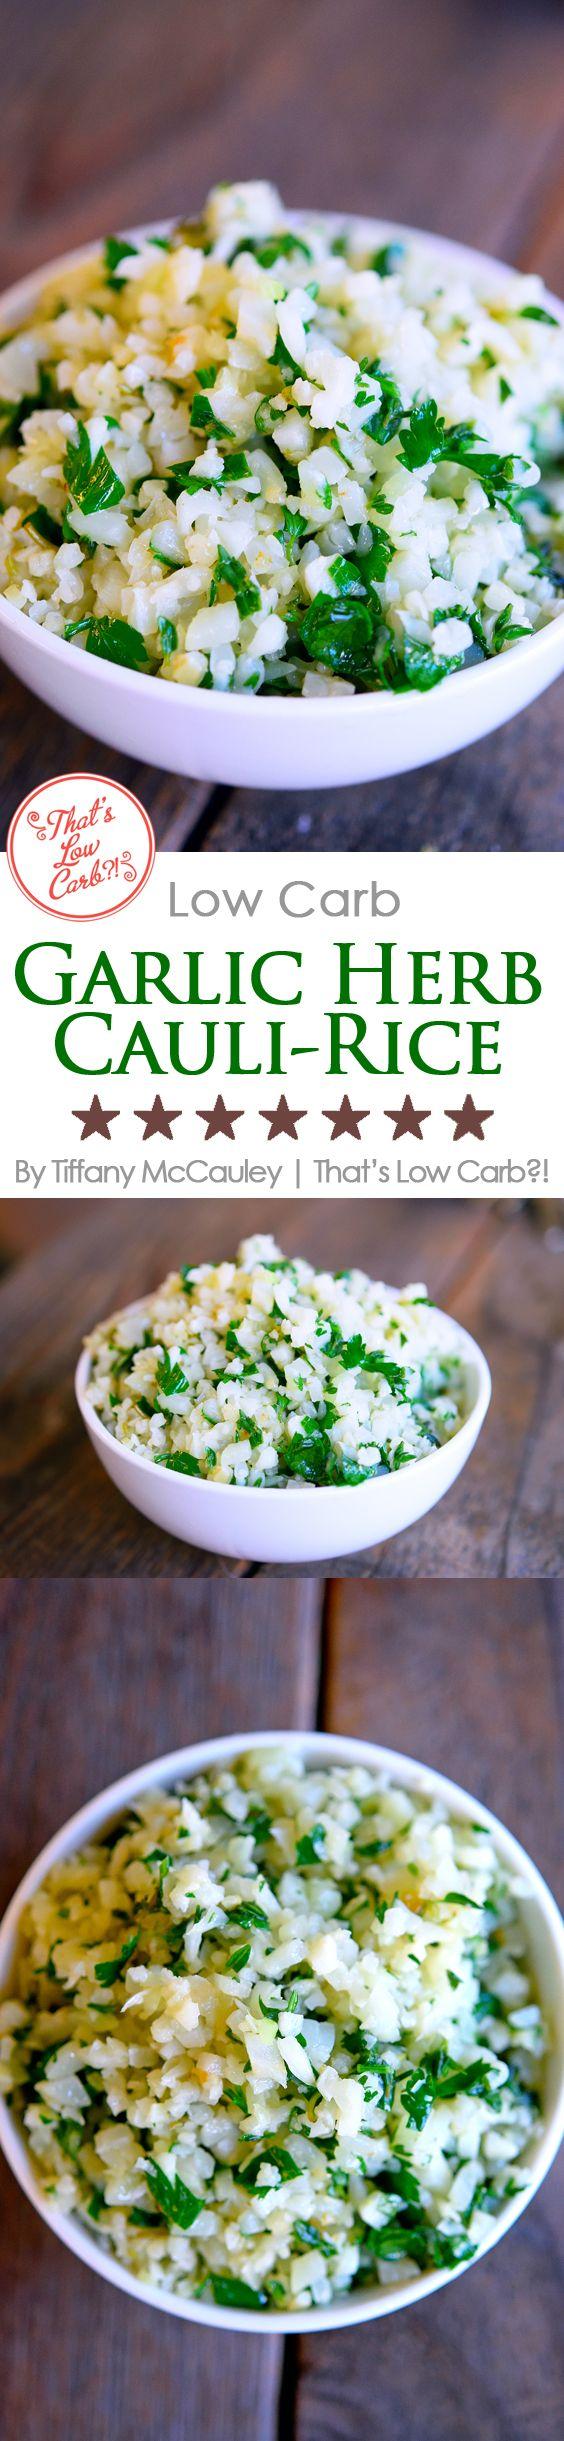 Low Carb Recipes | Low Carb Rice Recipe | Cauliflower Rice Recipe | Healthy Recipe